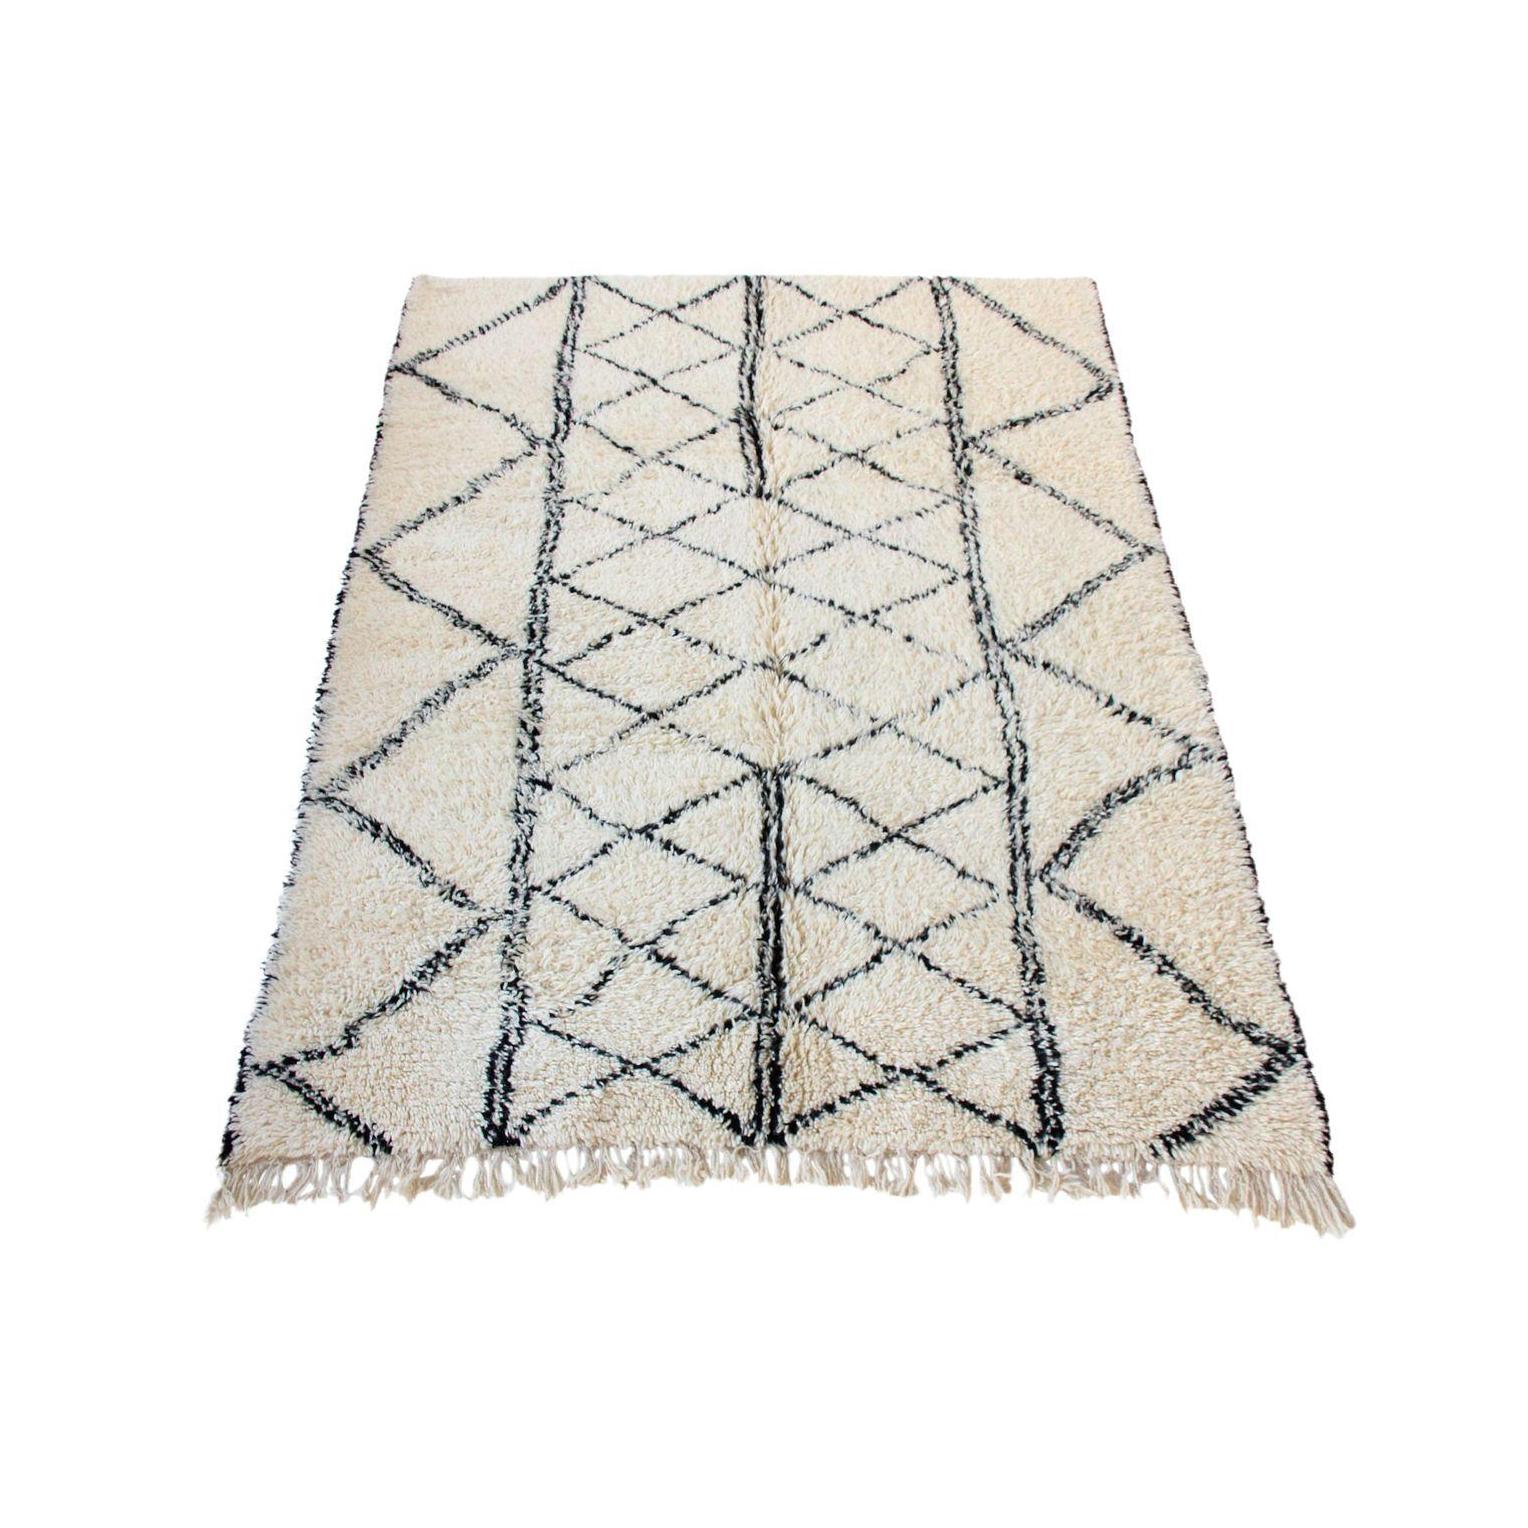 Black And White Tassel Rug: Large Vintage Moroccan Beni